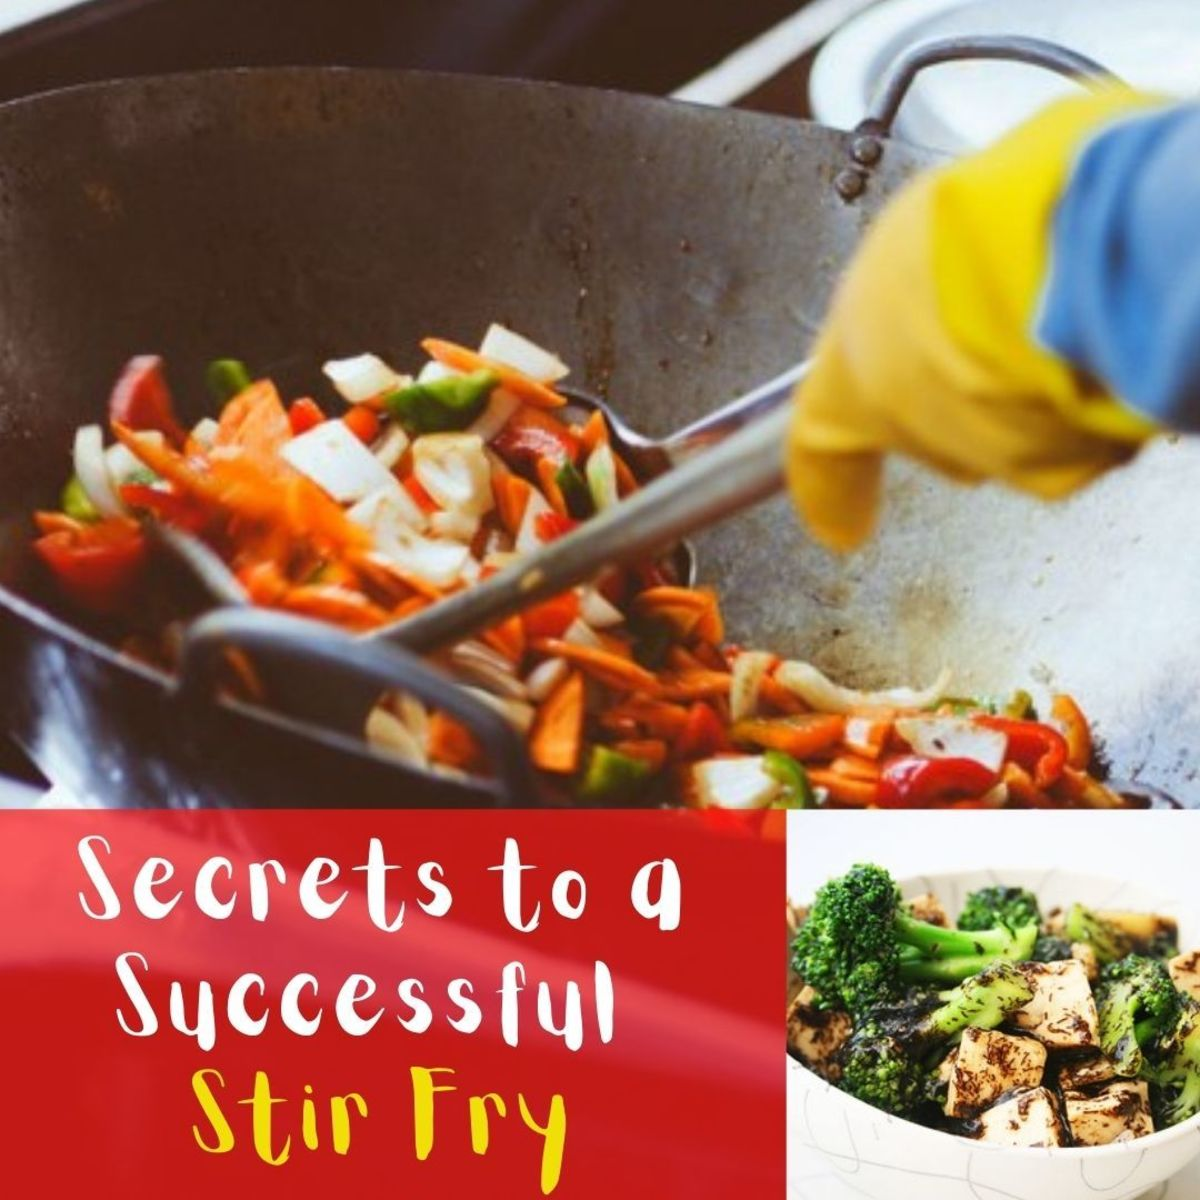 Secrets to a Successful Stir Fry